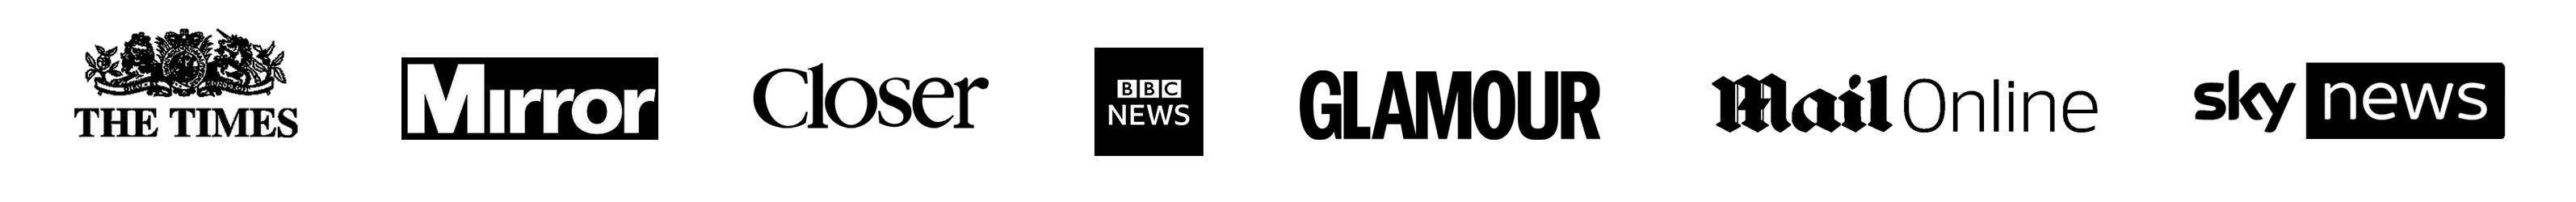 Newspaper and magazine logos